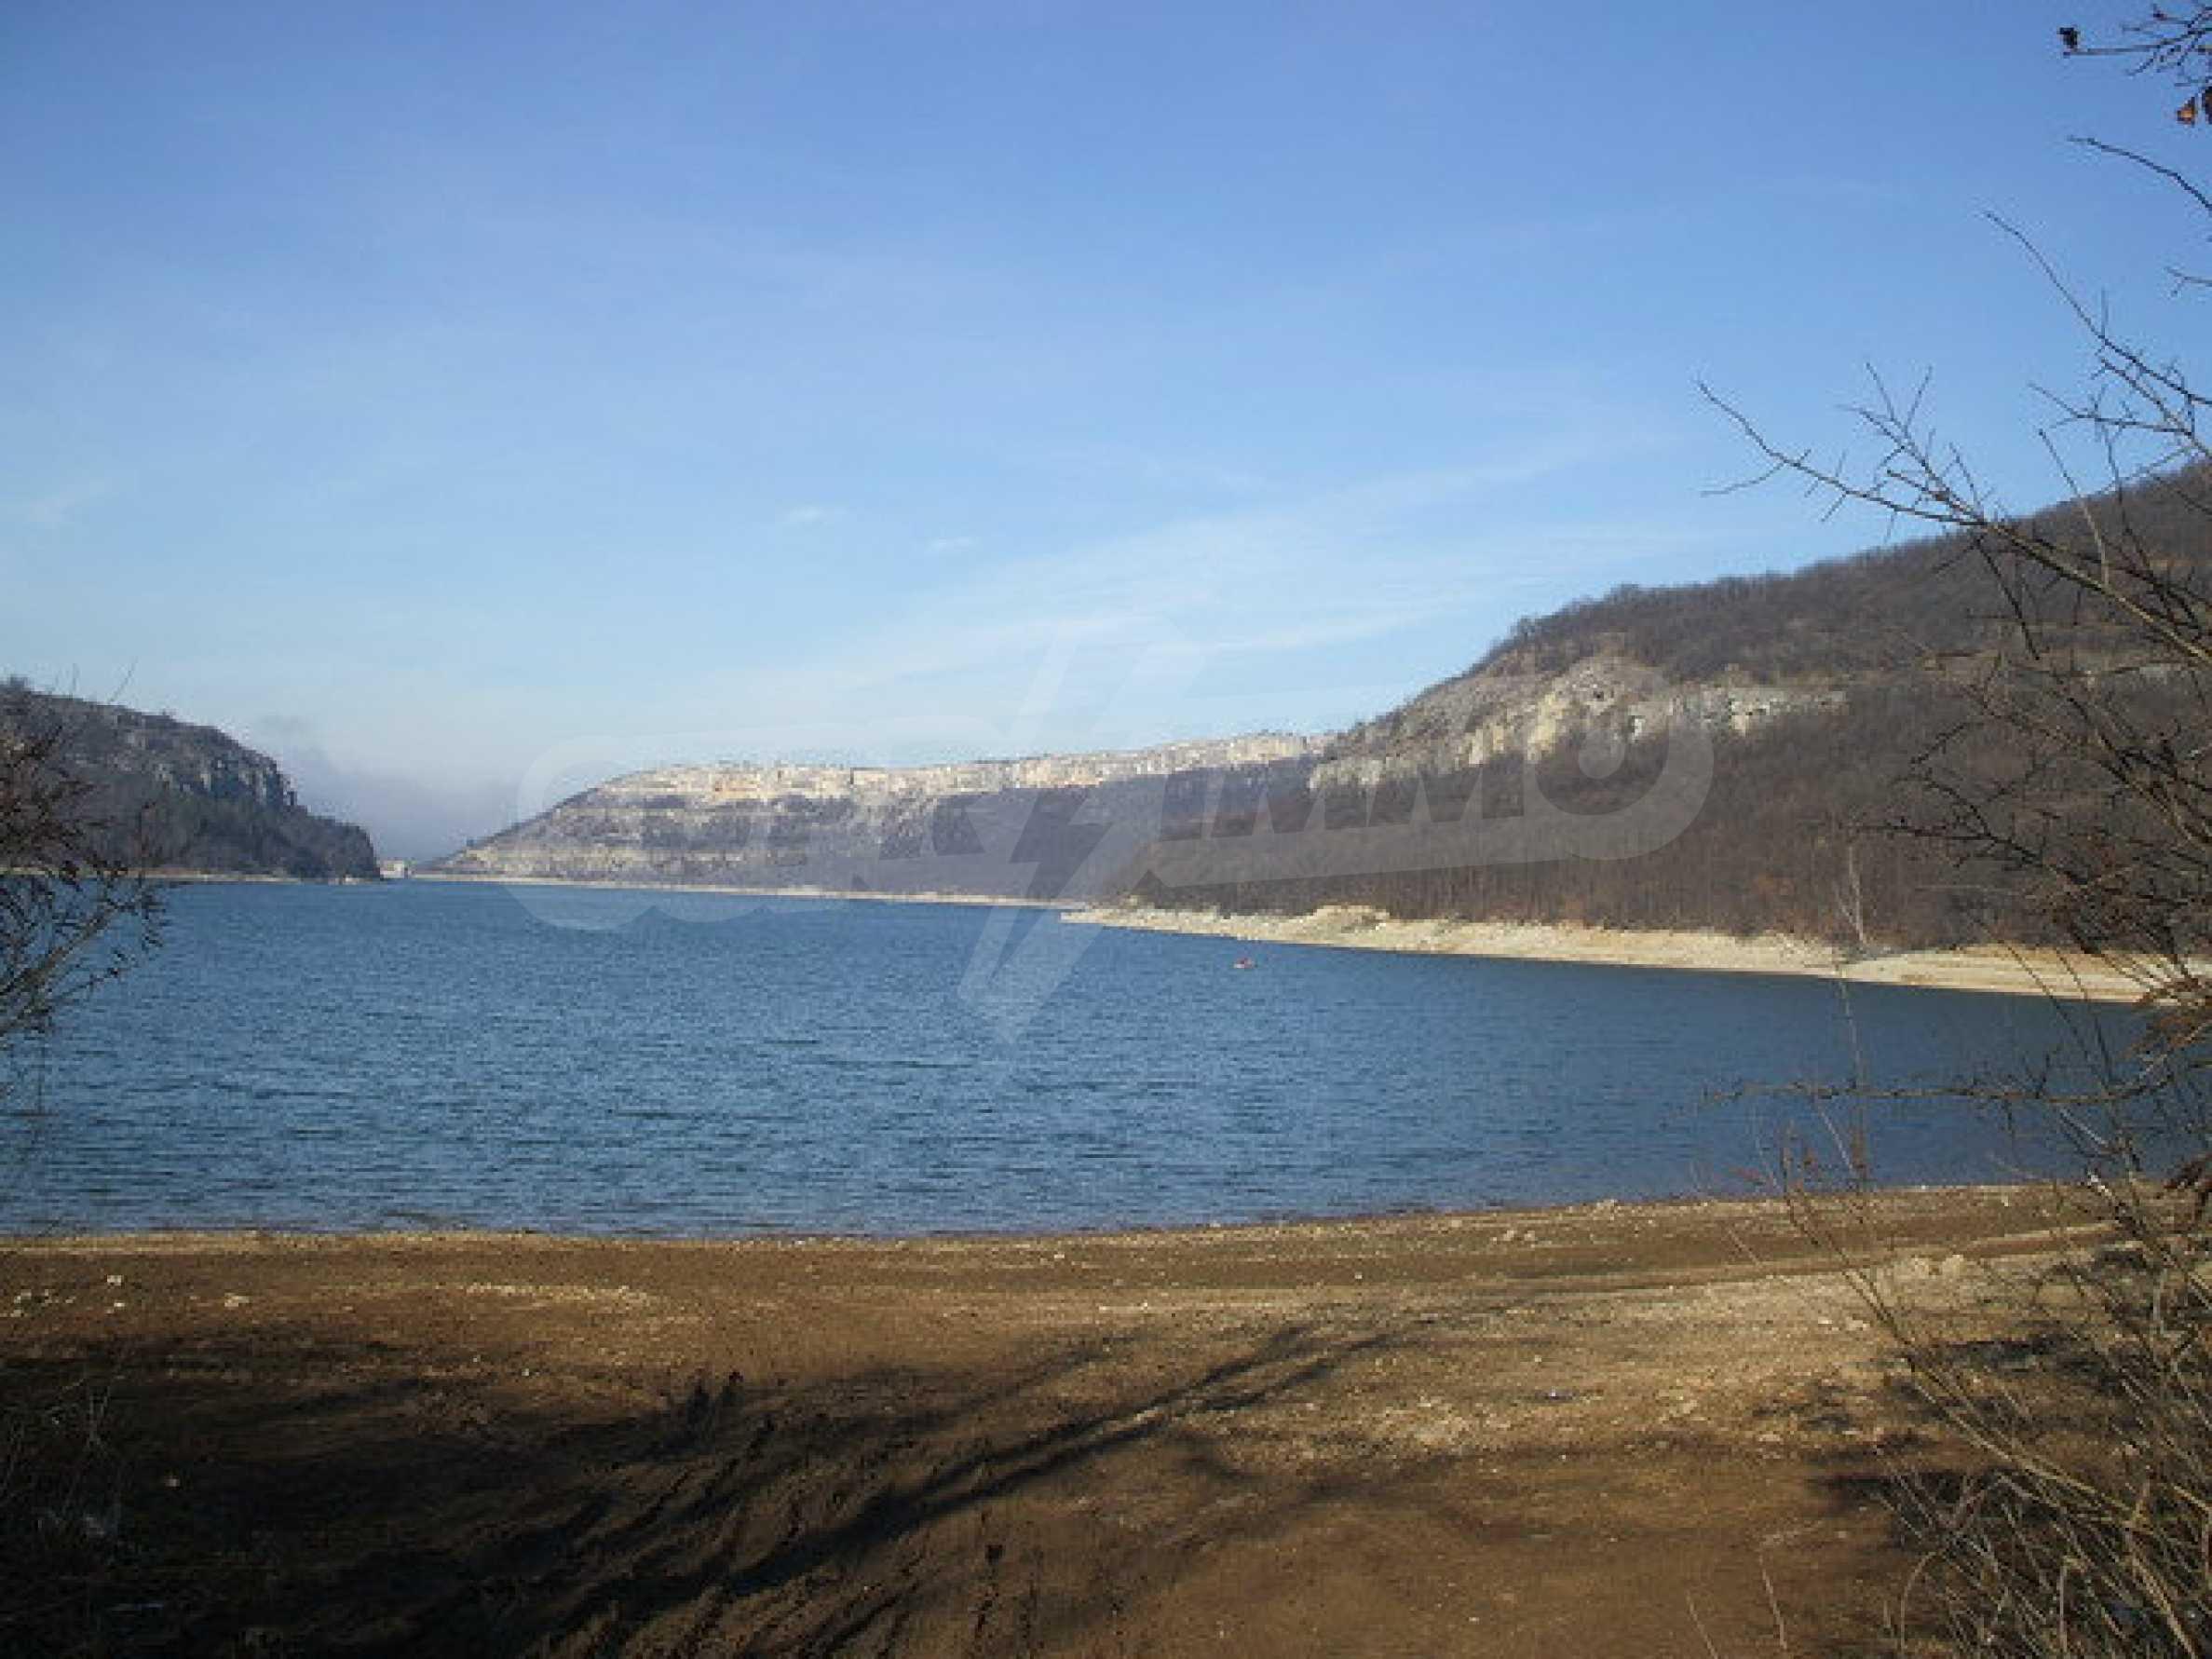 Land in regulation near Lake Alexander Stamboliyski 1